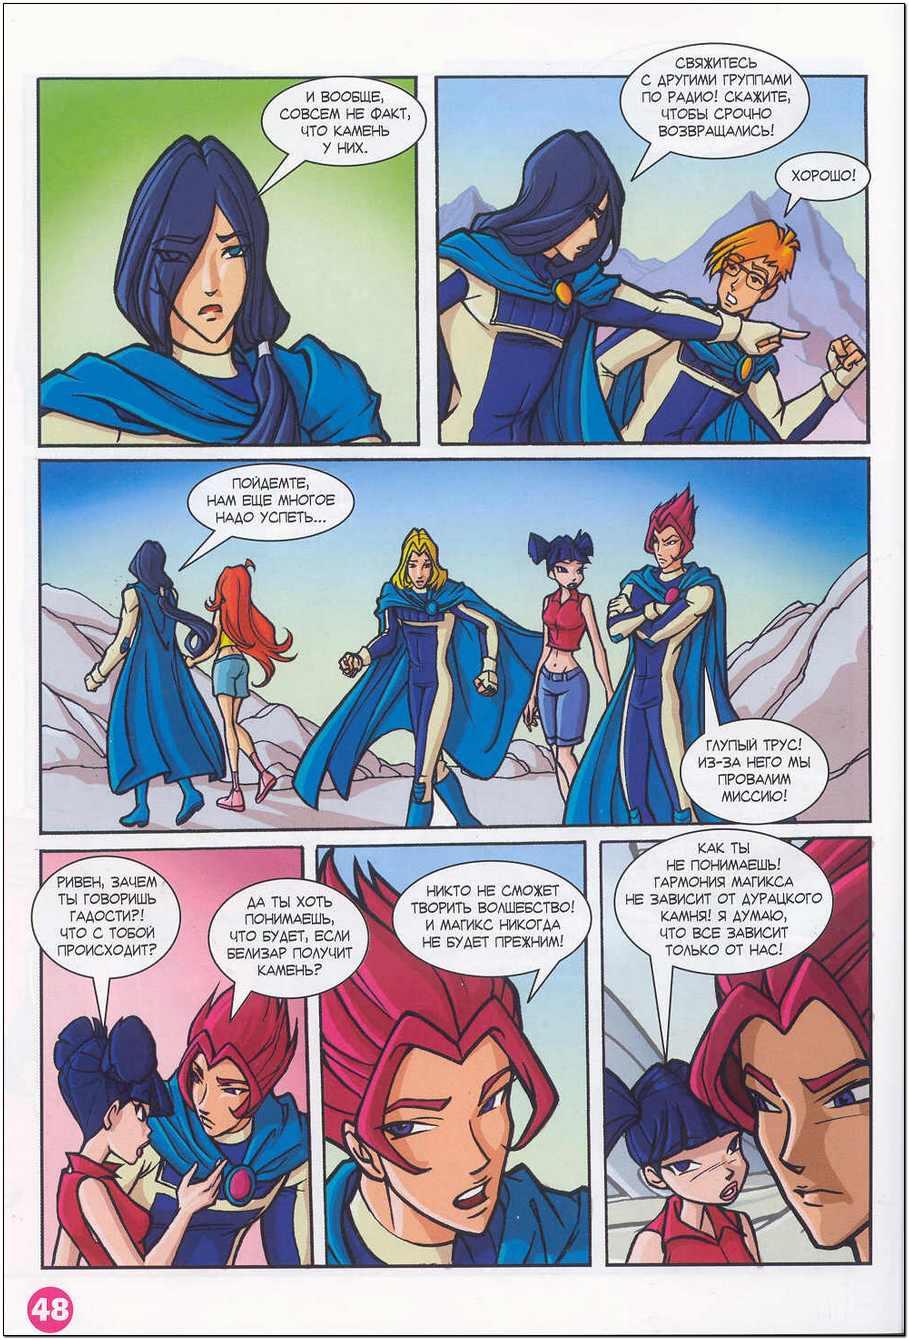 Комикс Винкс Winx - Камень Шааба (Журнал Винкс №3 2009)